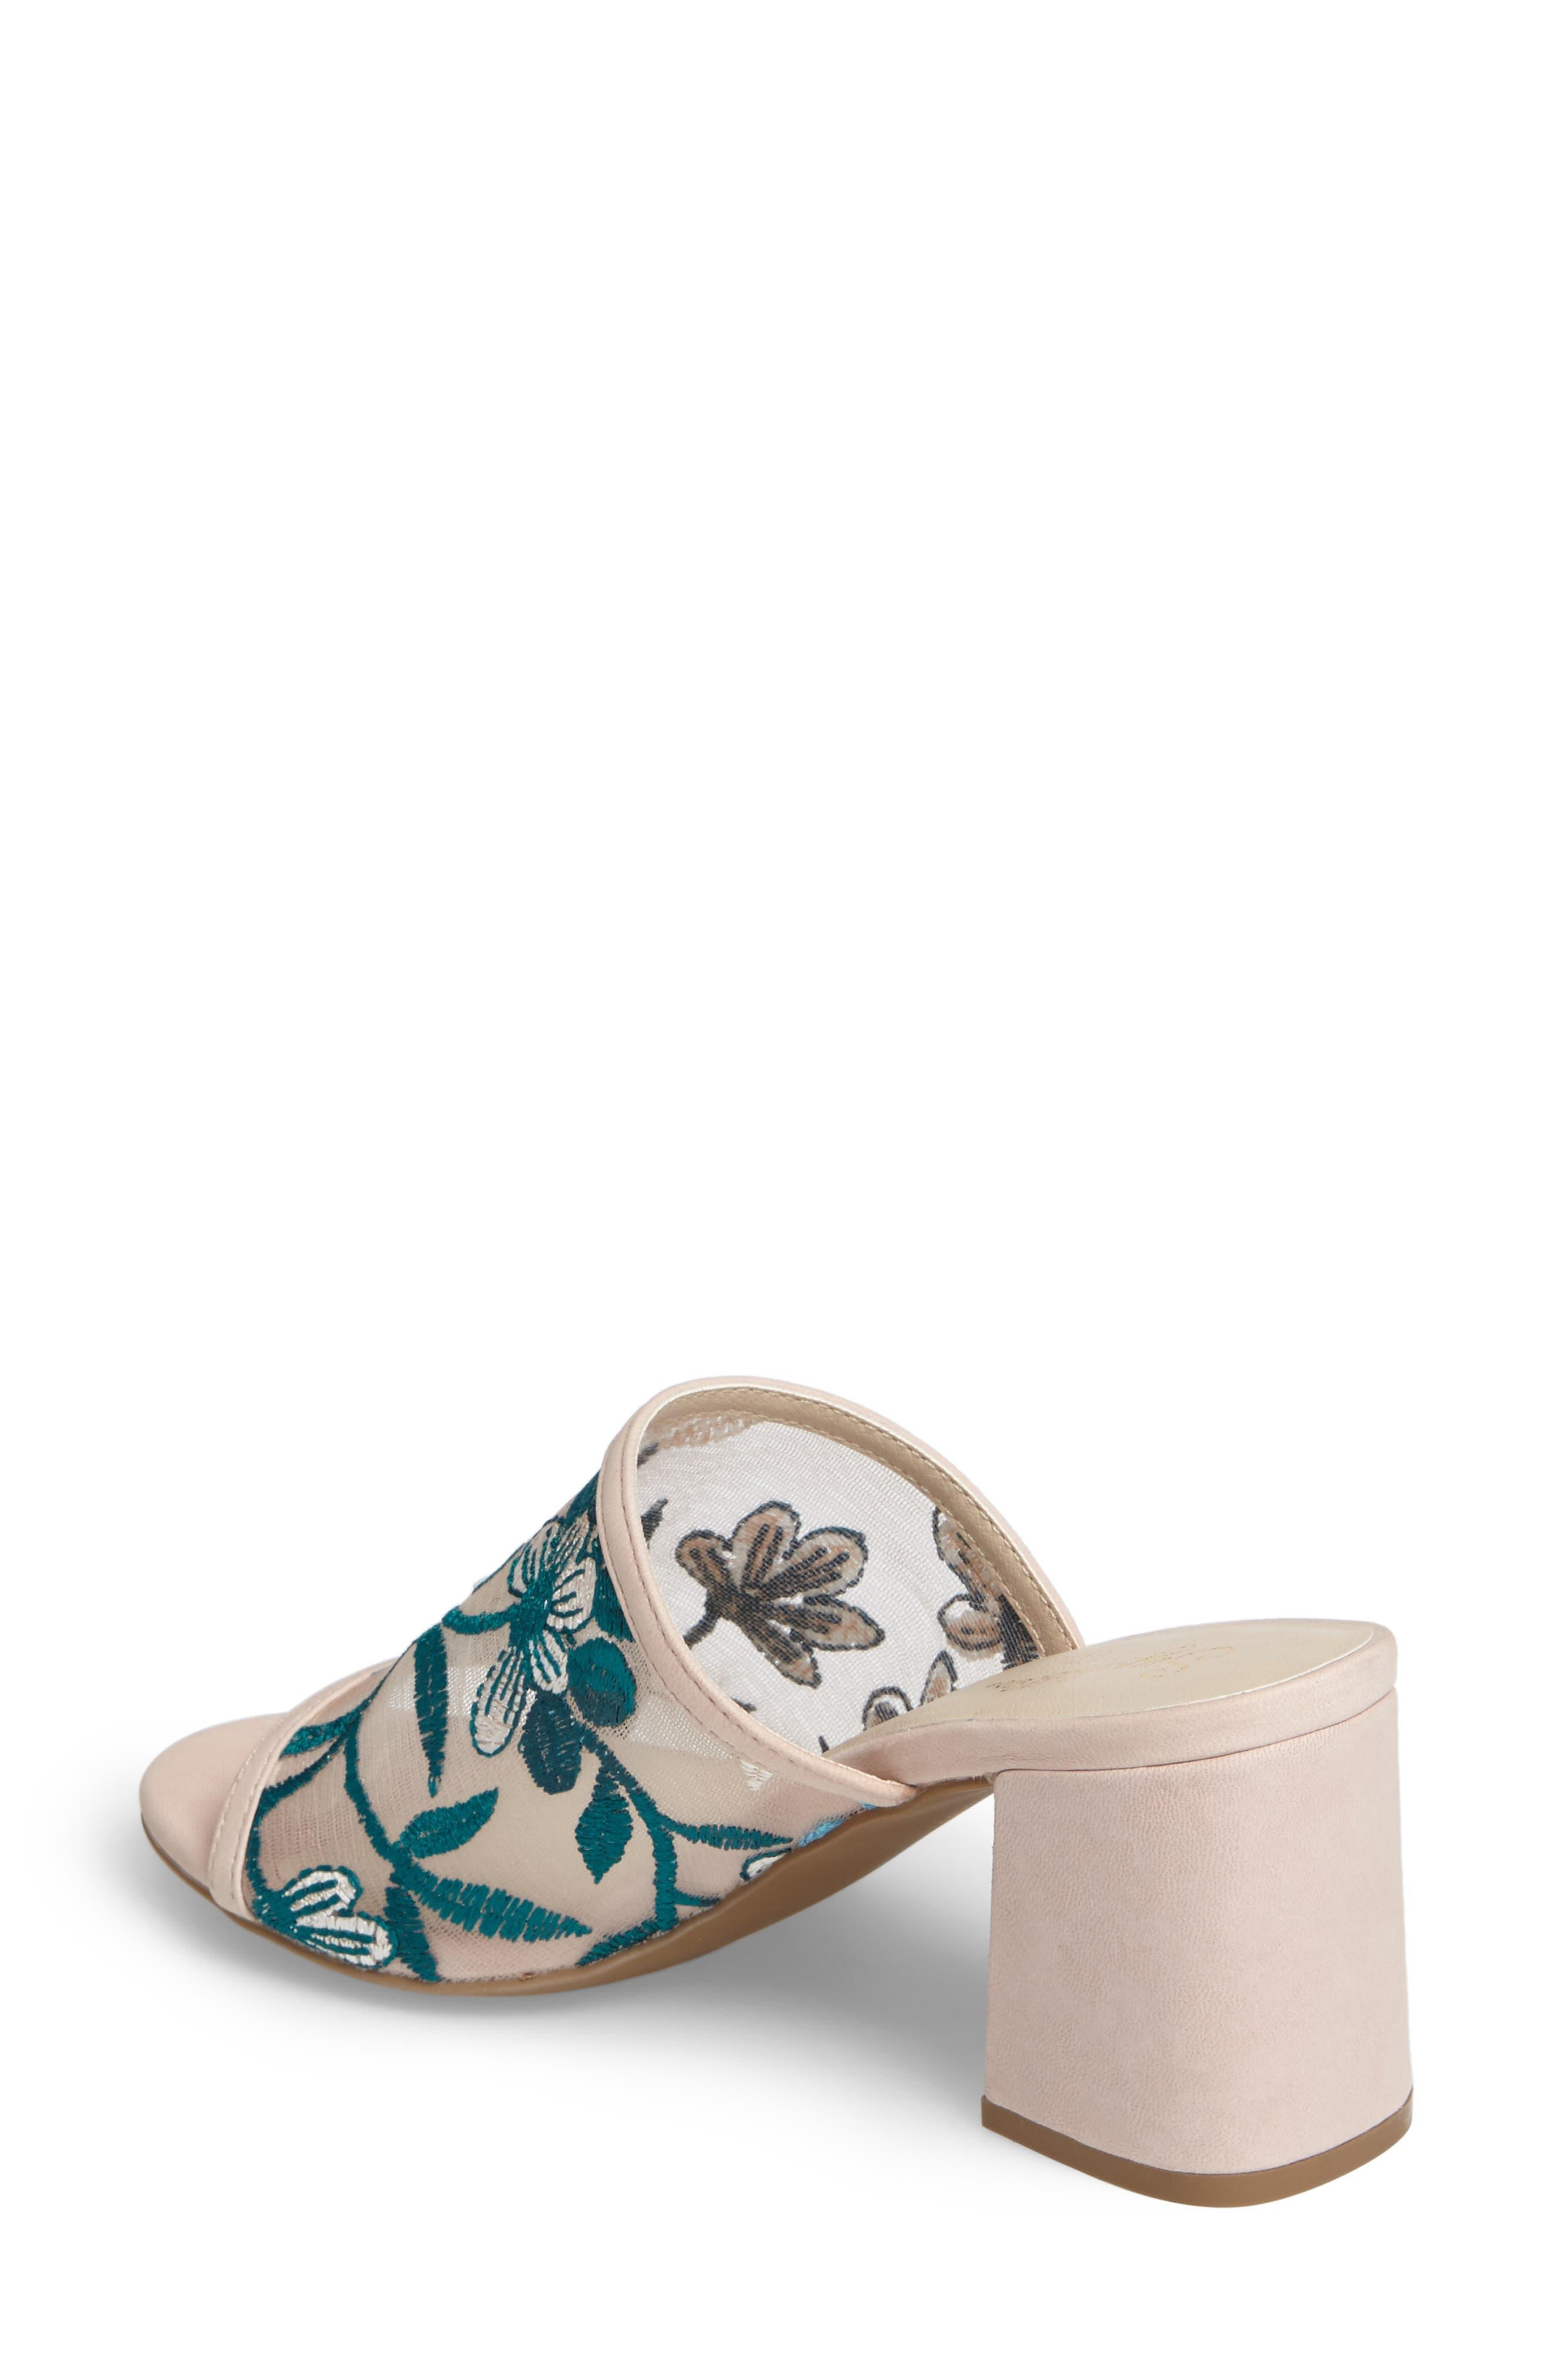 Nursery Block Heel Sandal,                             Alternate thumbnail 2, color,                             650